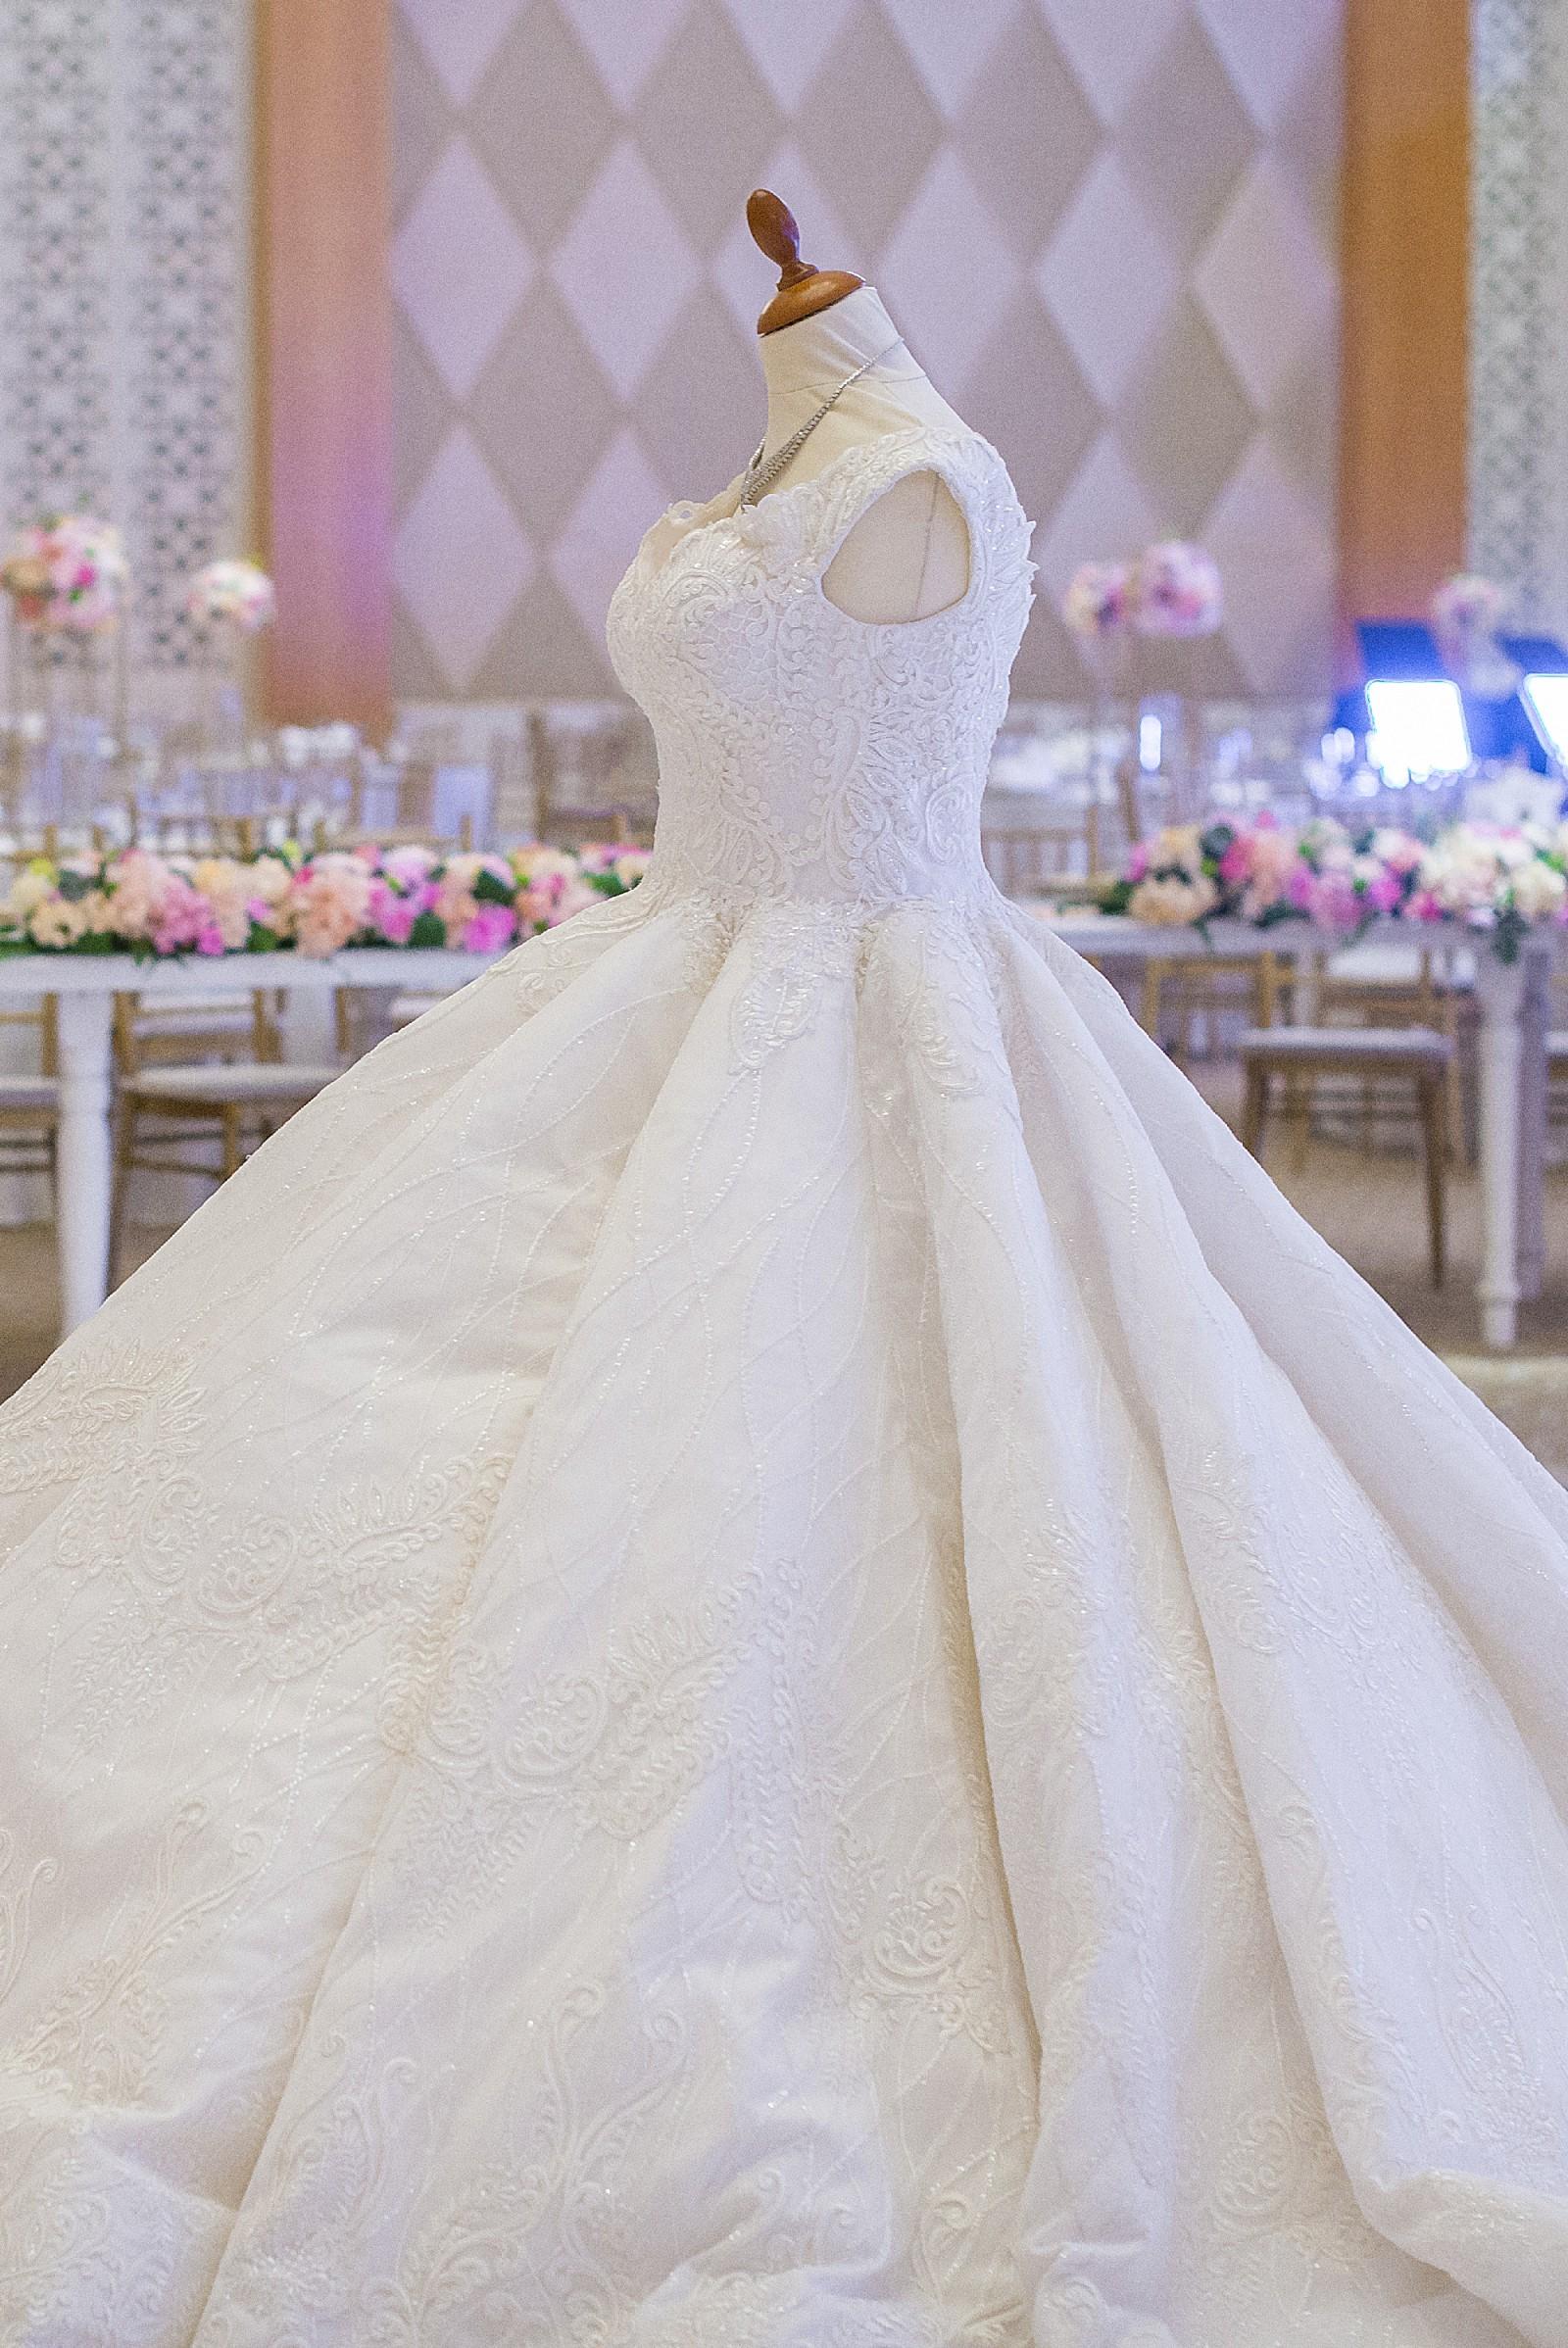 bba07a73332 Ball Gown Wedding Dresses Uk - Gomes Weine AG